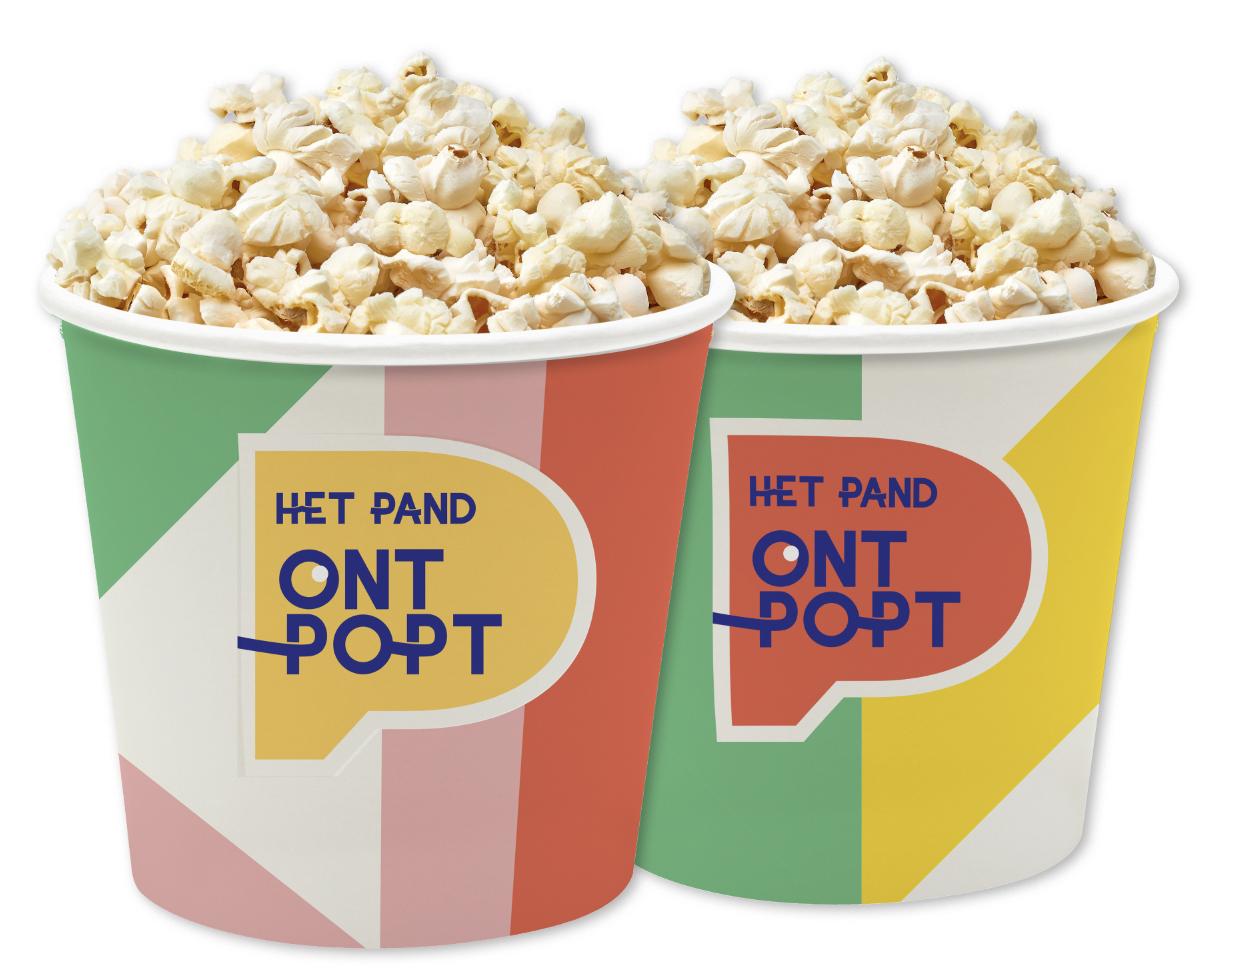 hetpandontpopt_popcorn